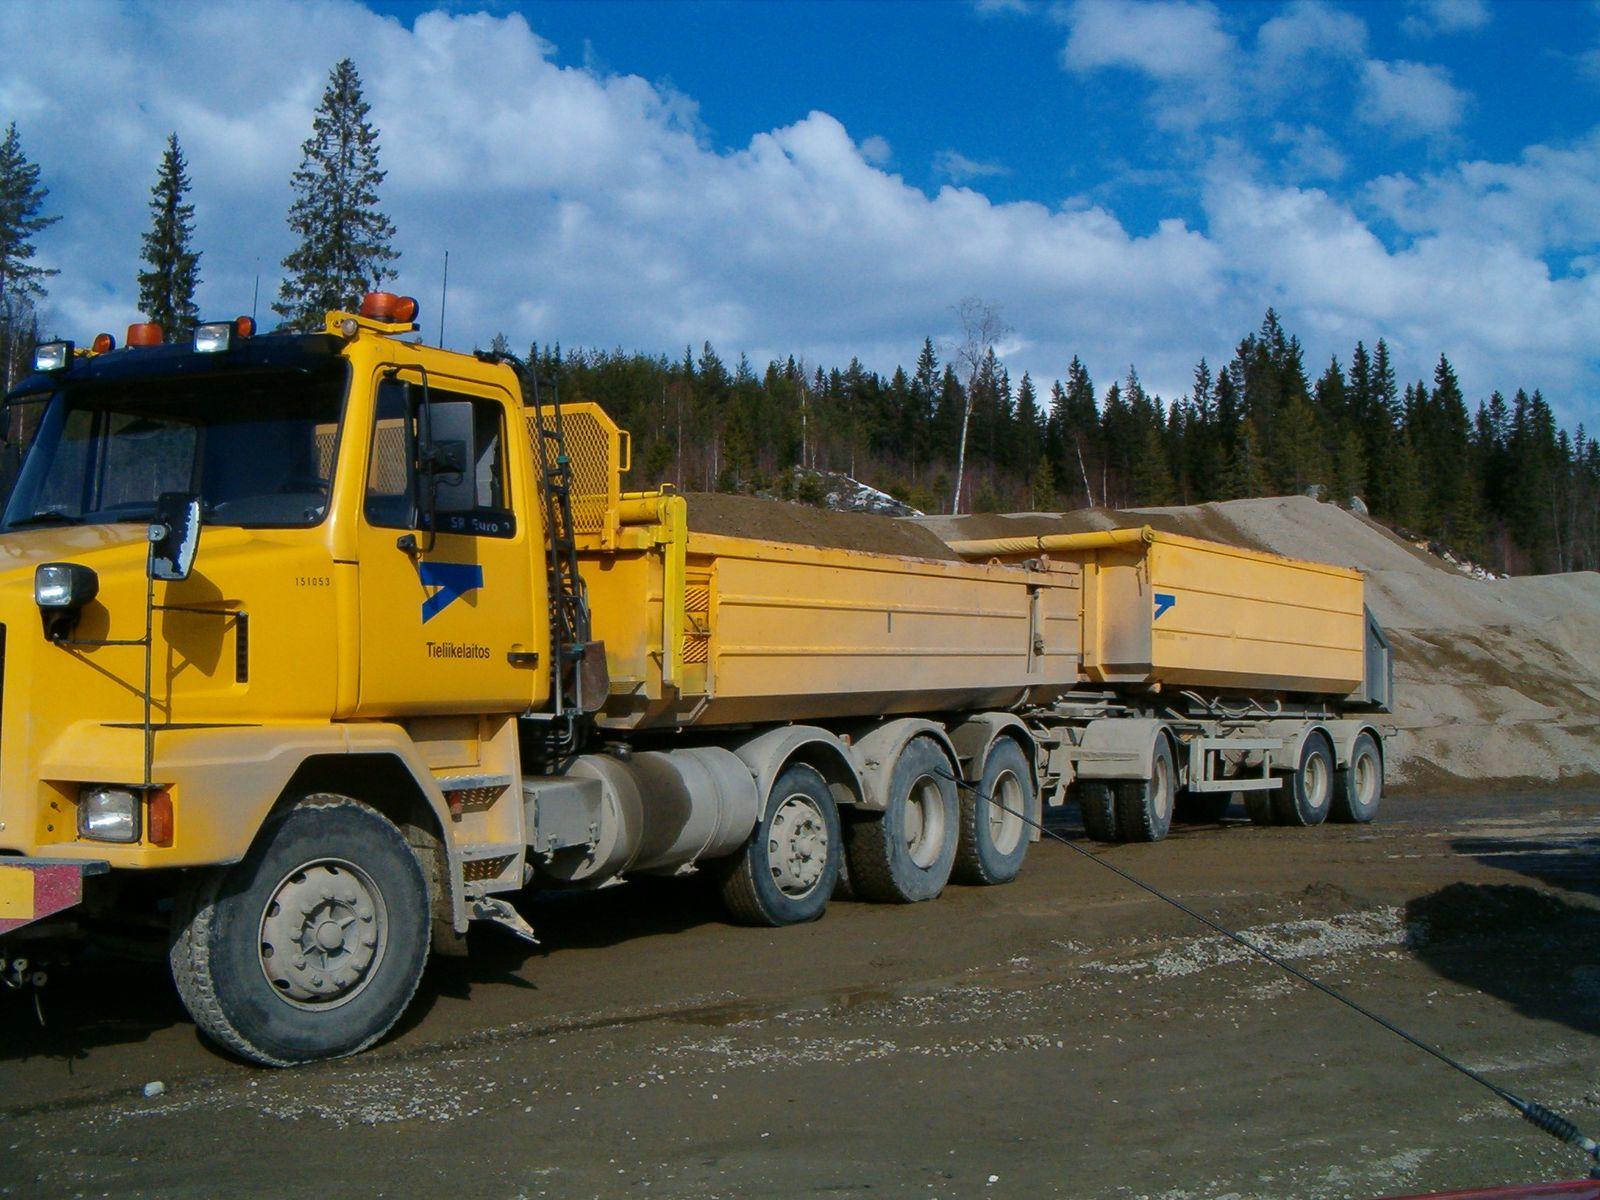 File Tielaitos Sisu Dump Truck Jpg Wikimedia Commons